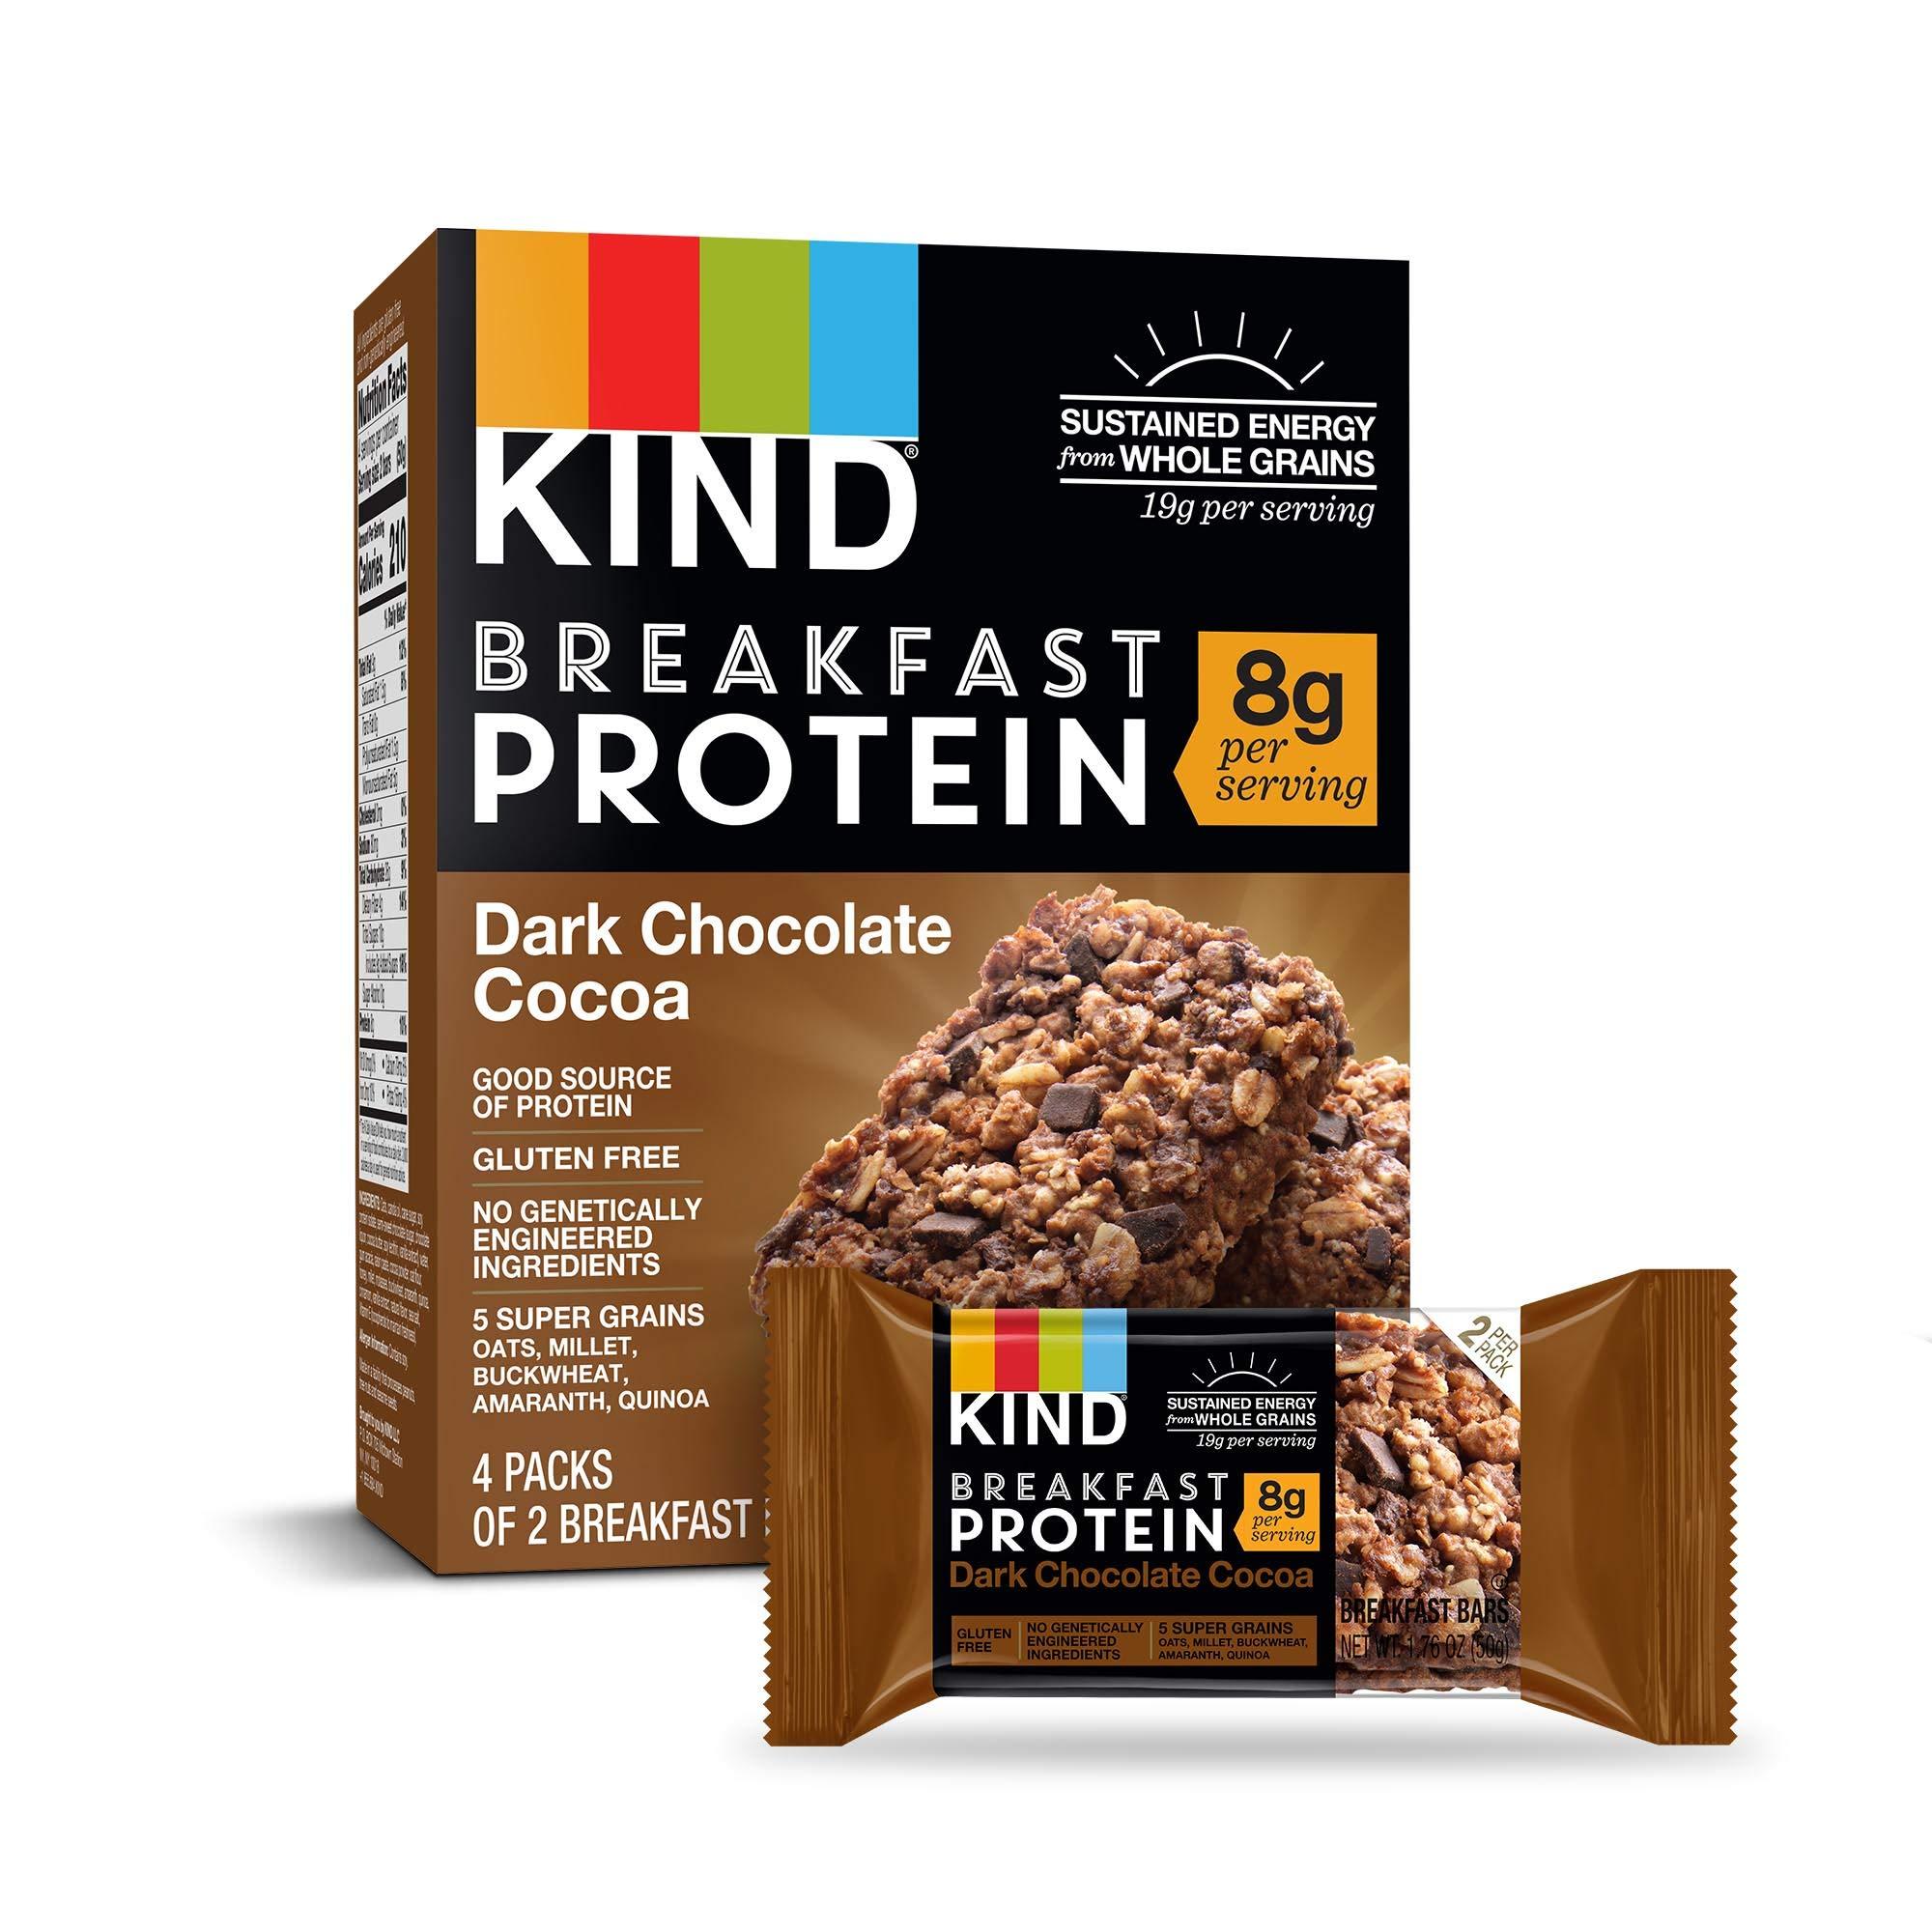 KIND Breakfast Bars, Dark Chocolate Cocoa, Gluten Free, 1.8oz, 32 Count by KIND